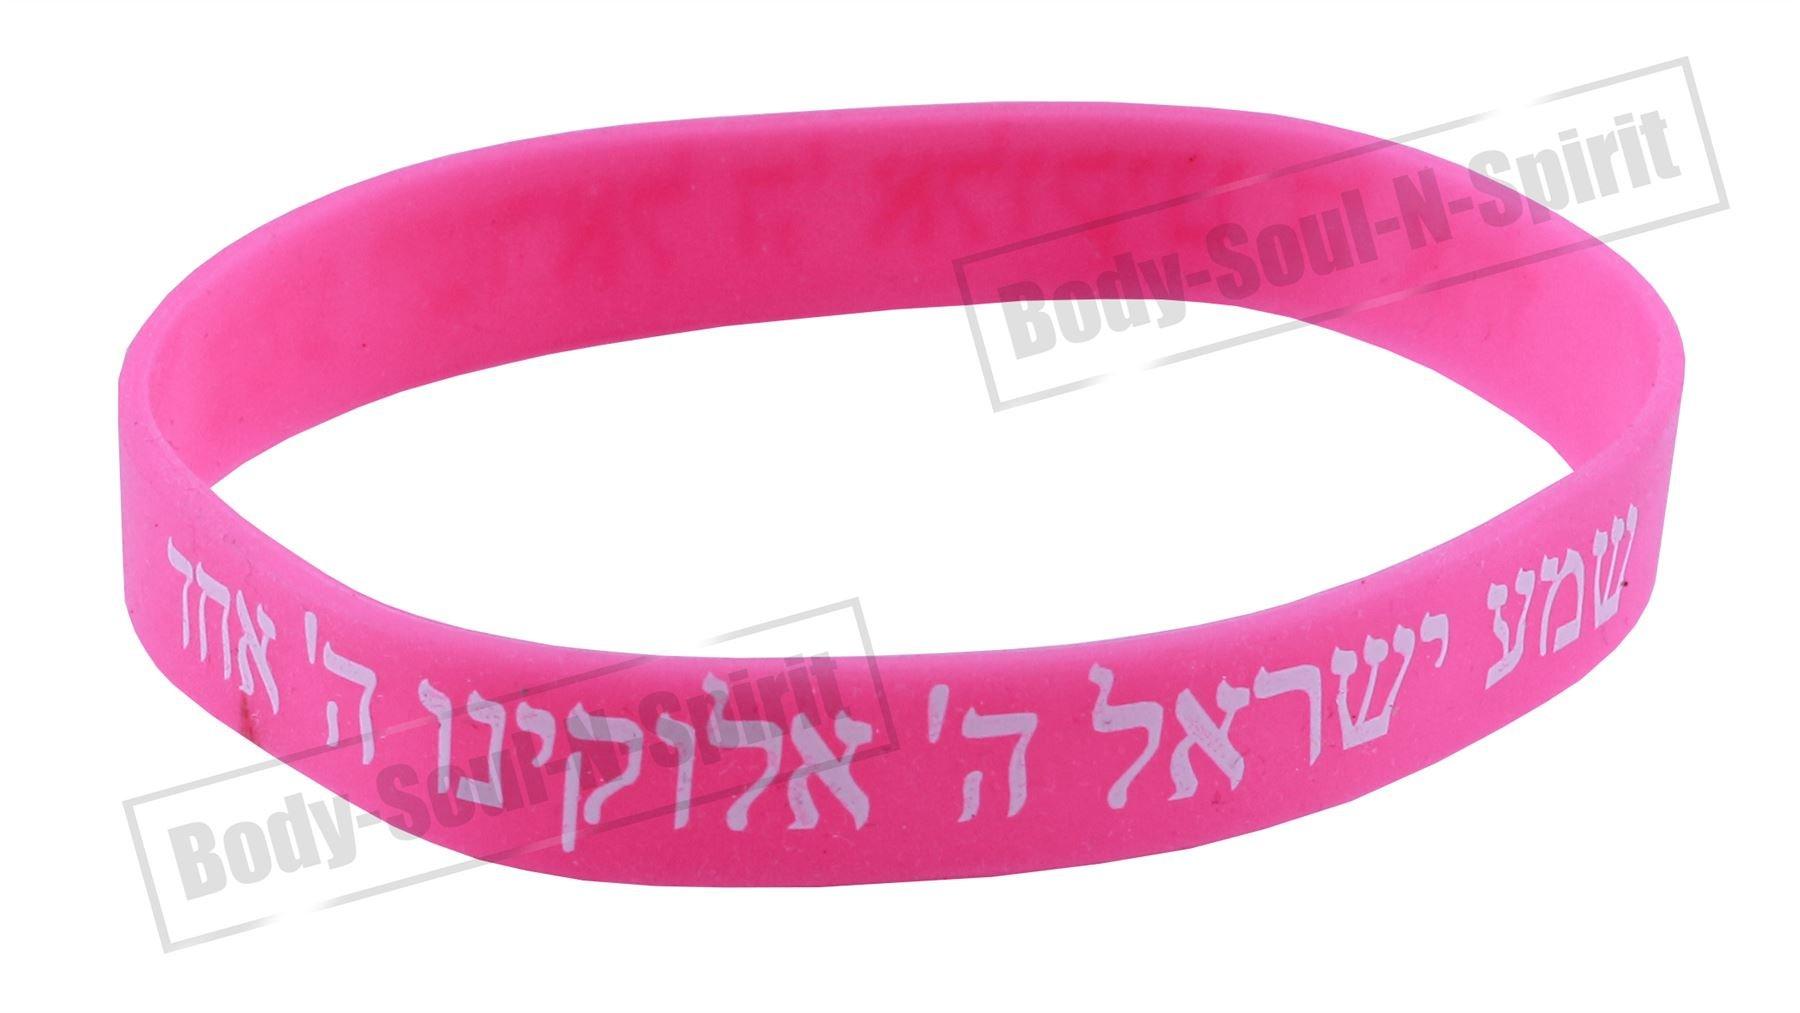 Pink Shema Israel Rubber Bracelet Hebrew Jewish Kabbalah Judaica Wristband by Body-Soul-n-Spirit Bracelet (Image #2)